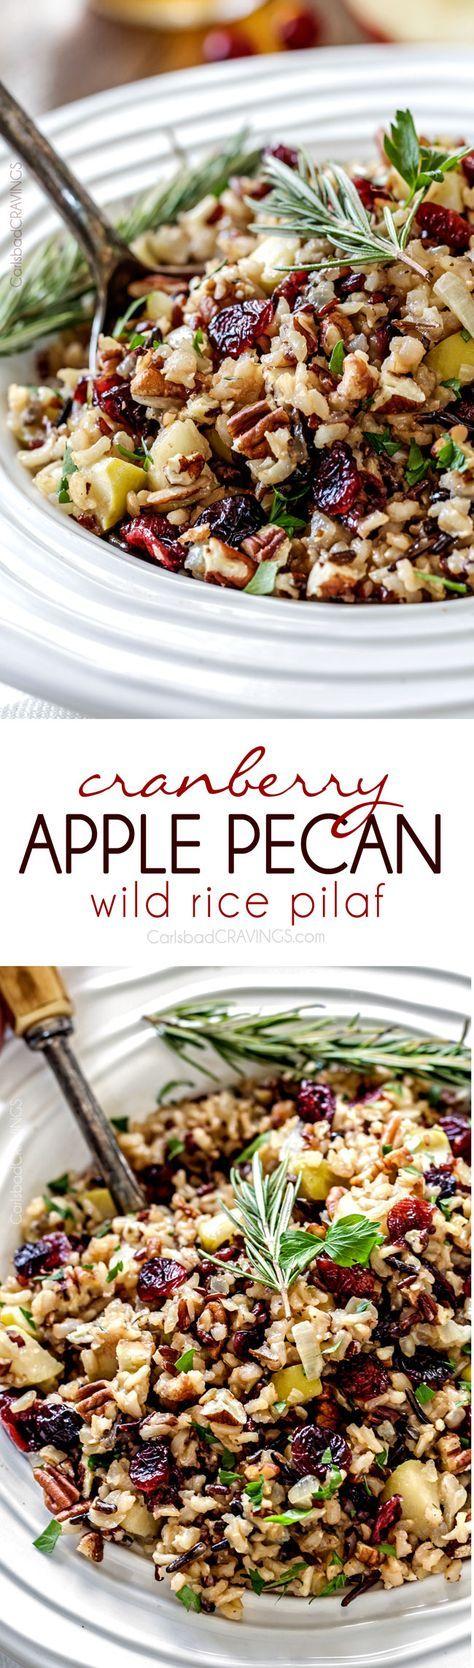 Cranberry Apple Pecan Wild Rice Pilaf.